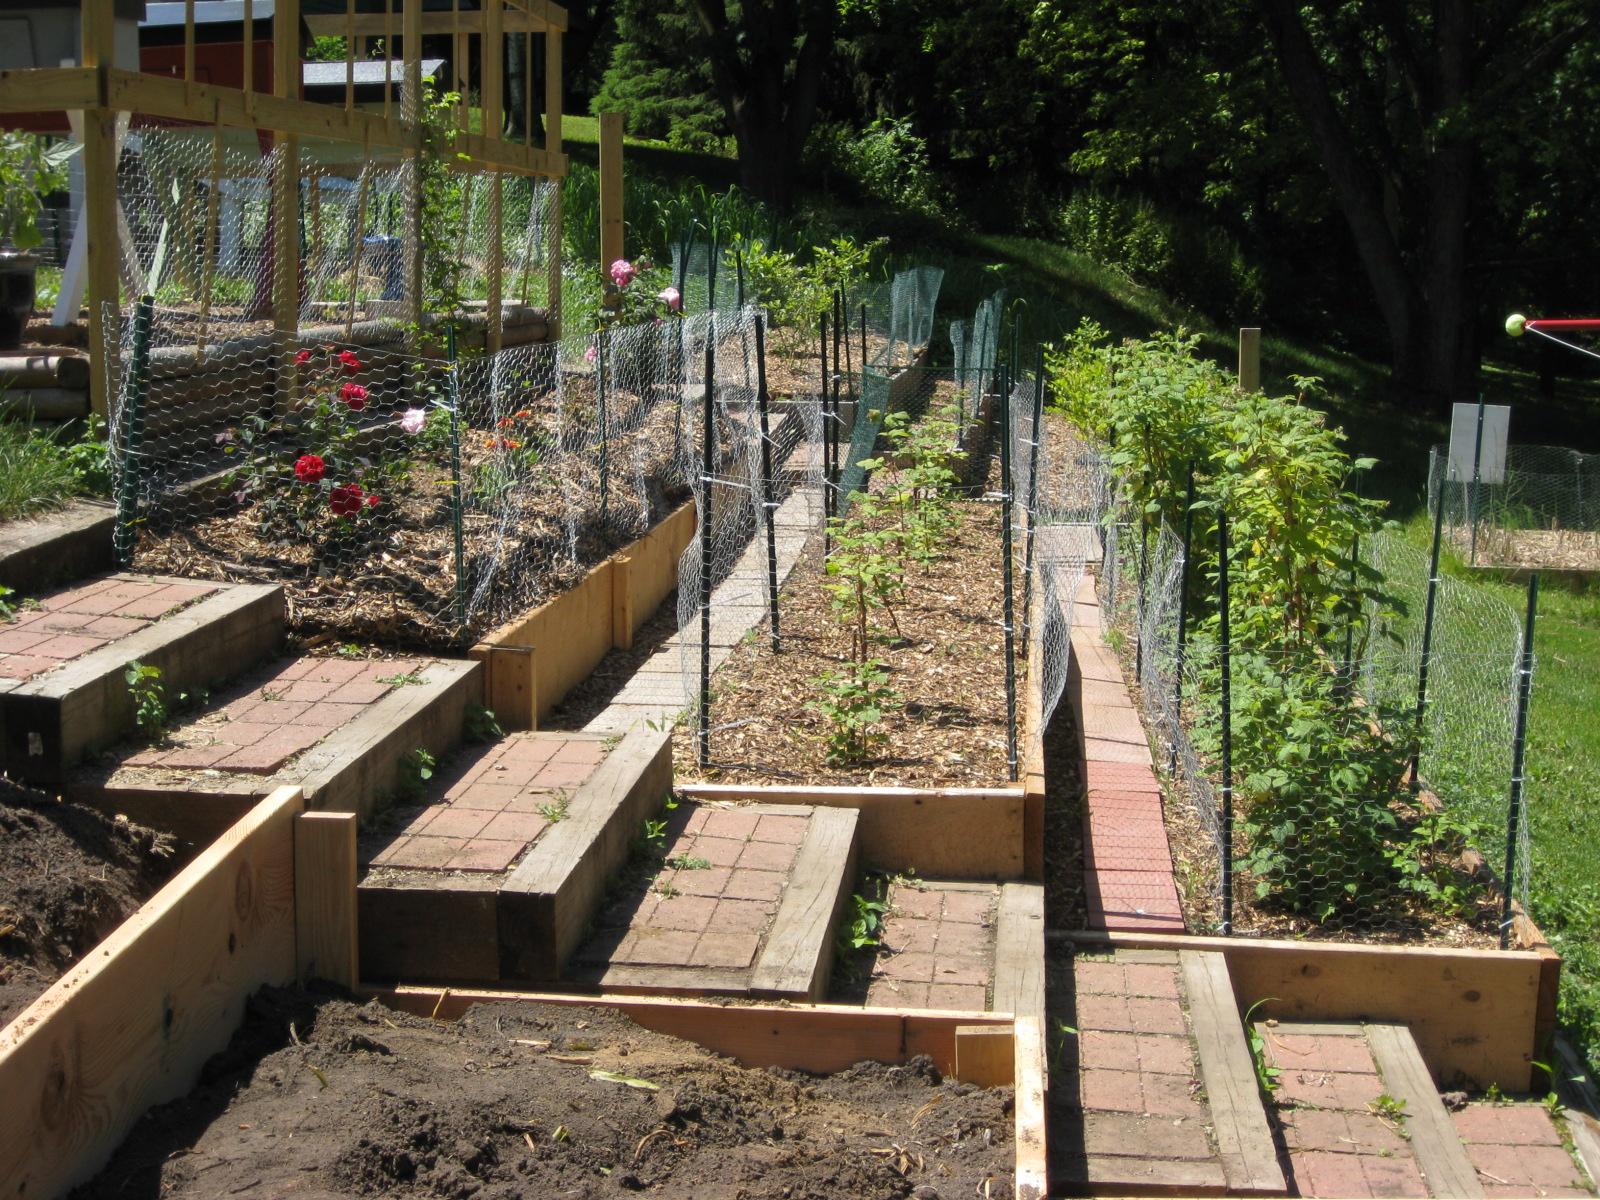 Red Bucket Farm: Garden Terraces on Steep Hill Backyard Ideas id=81636